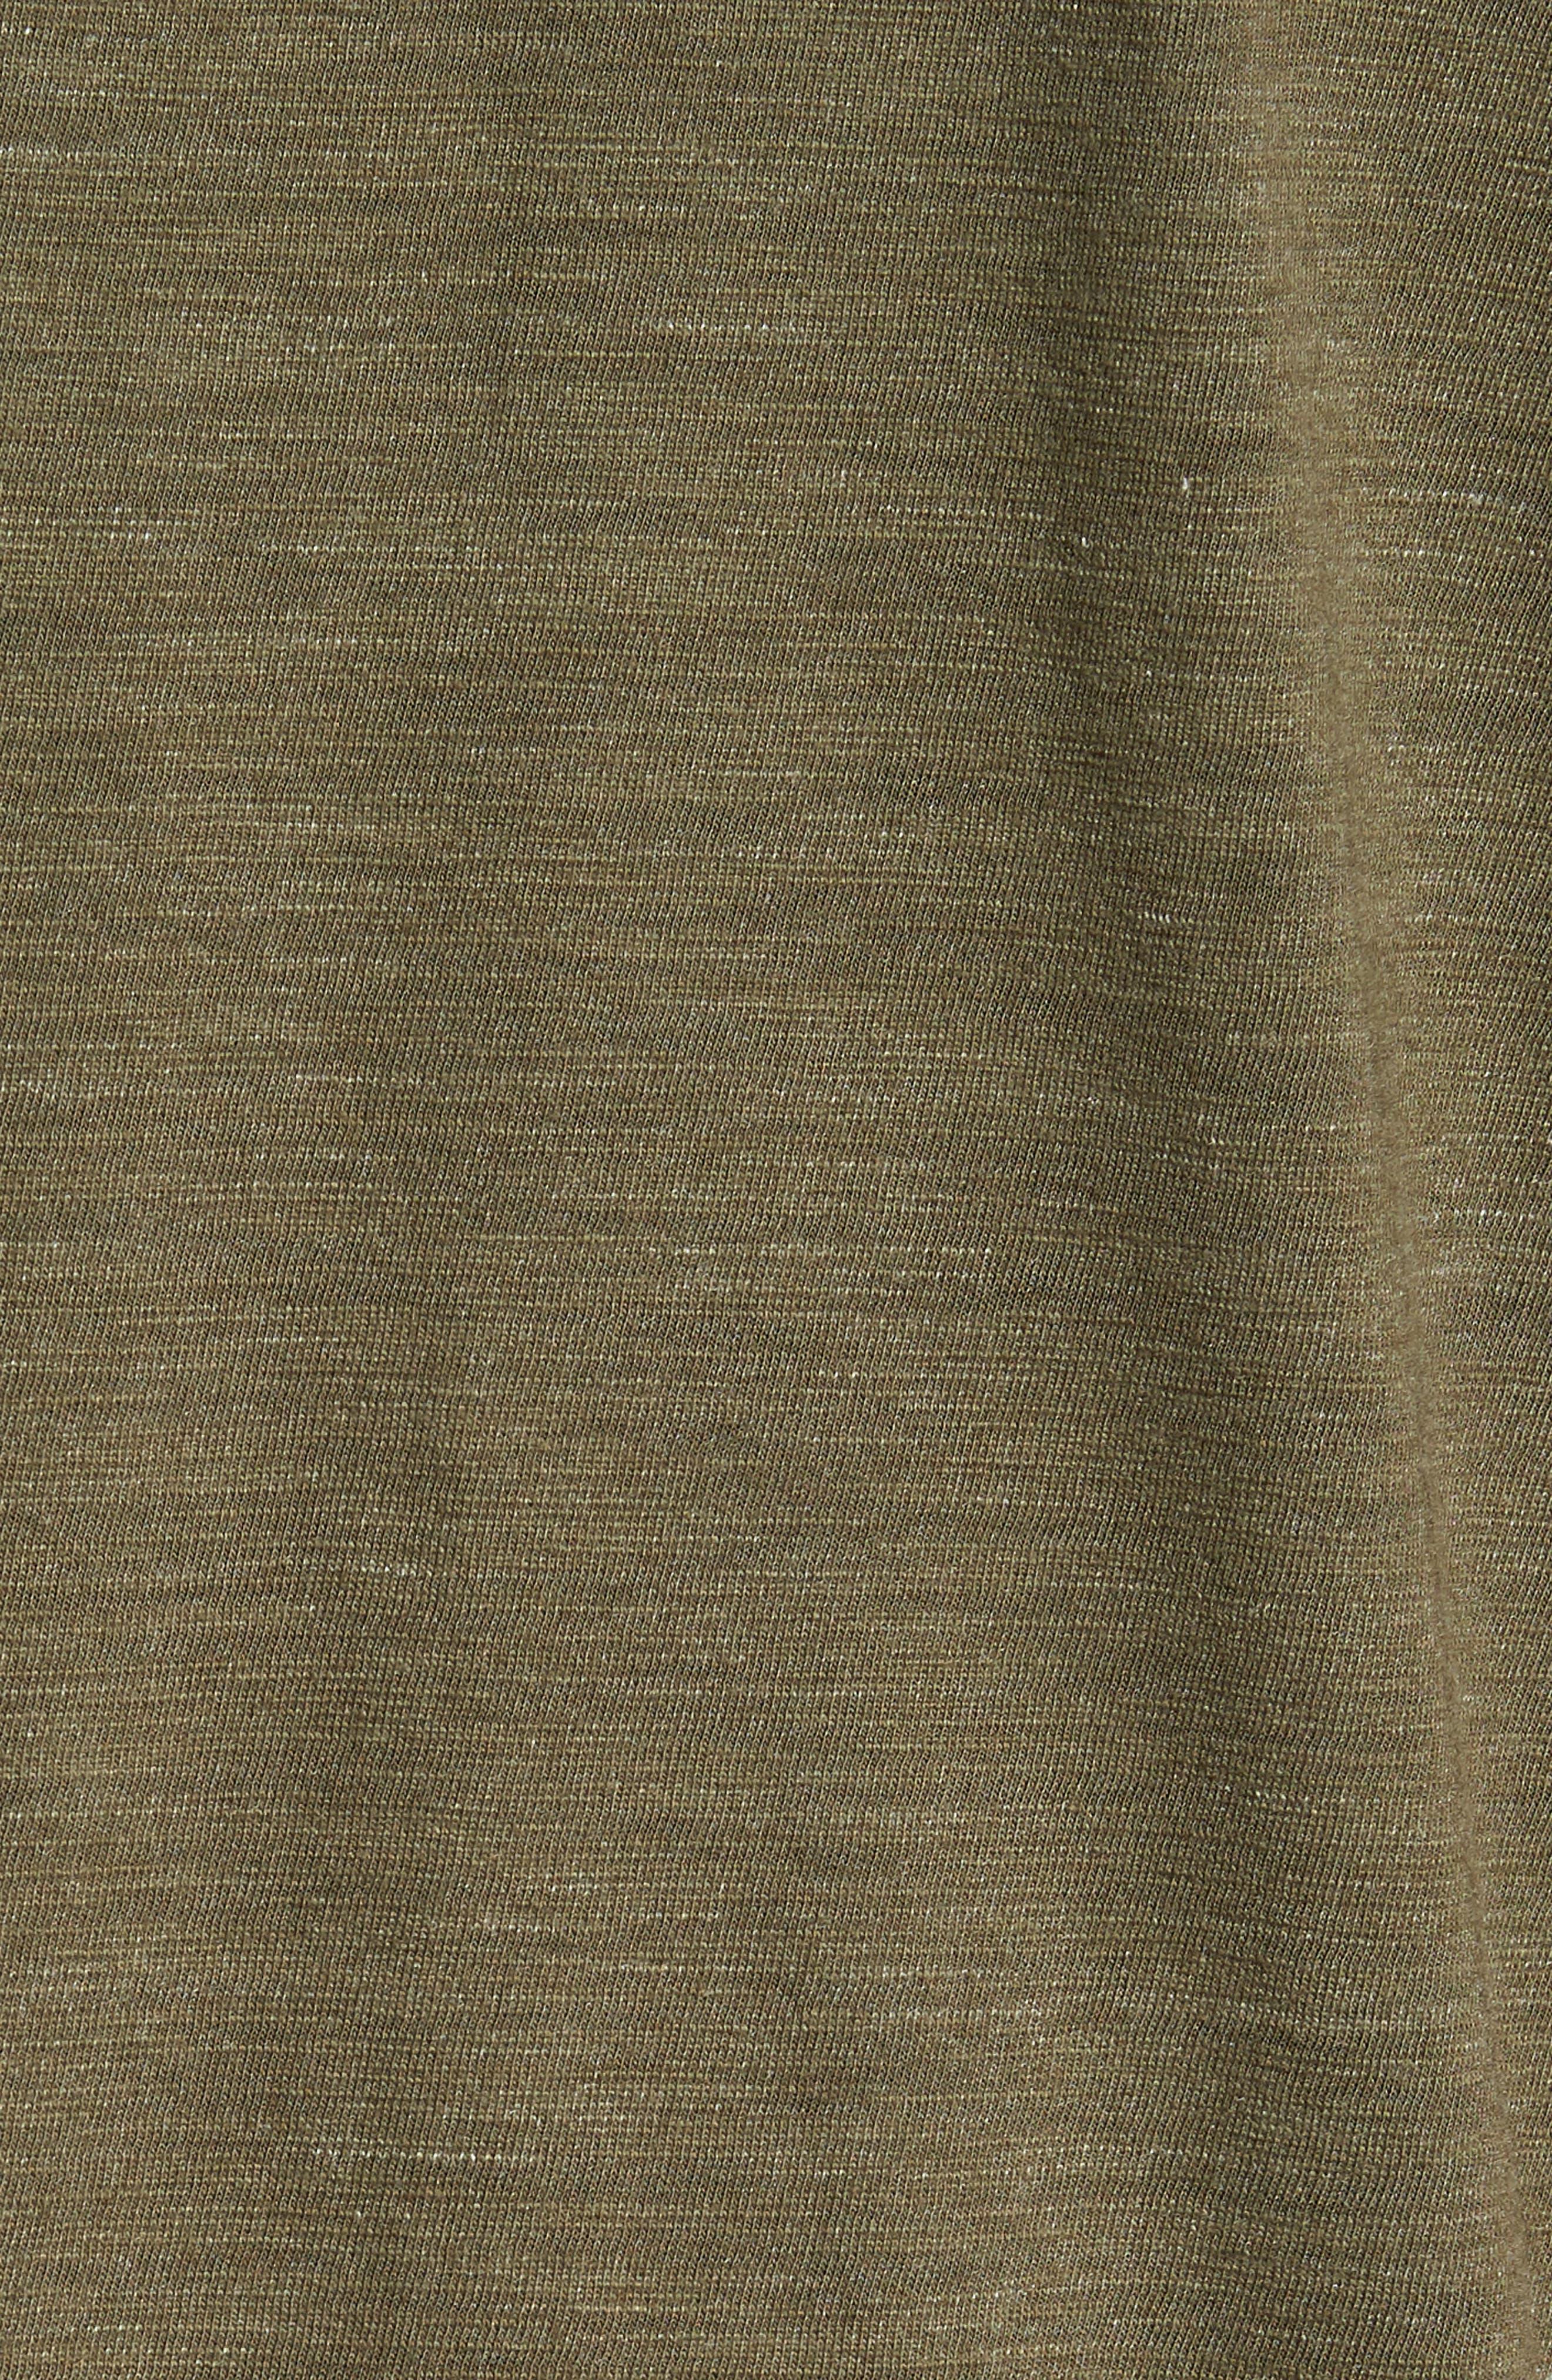 Space Dyed Pocket Polo,                             Alternate thumbnail 4, color,                             Green Bronze Spacedye